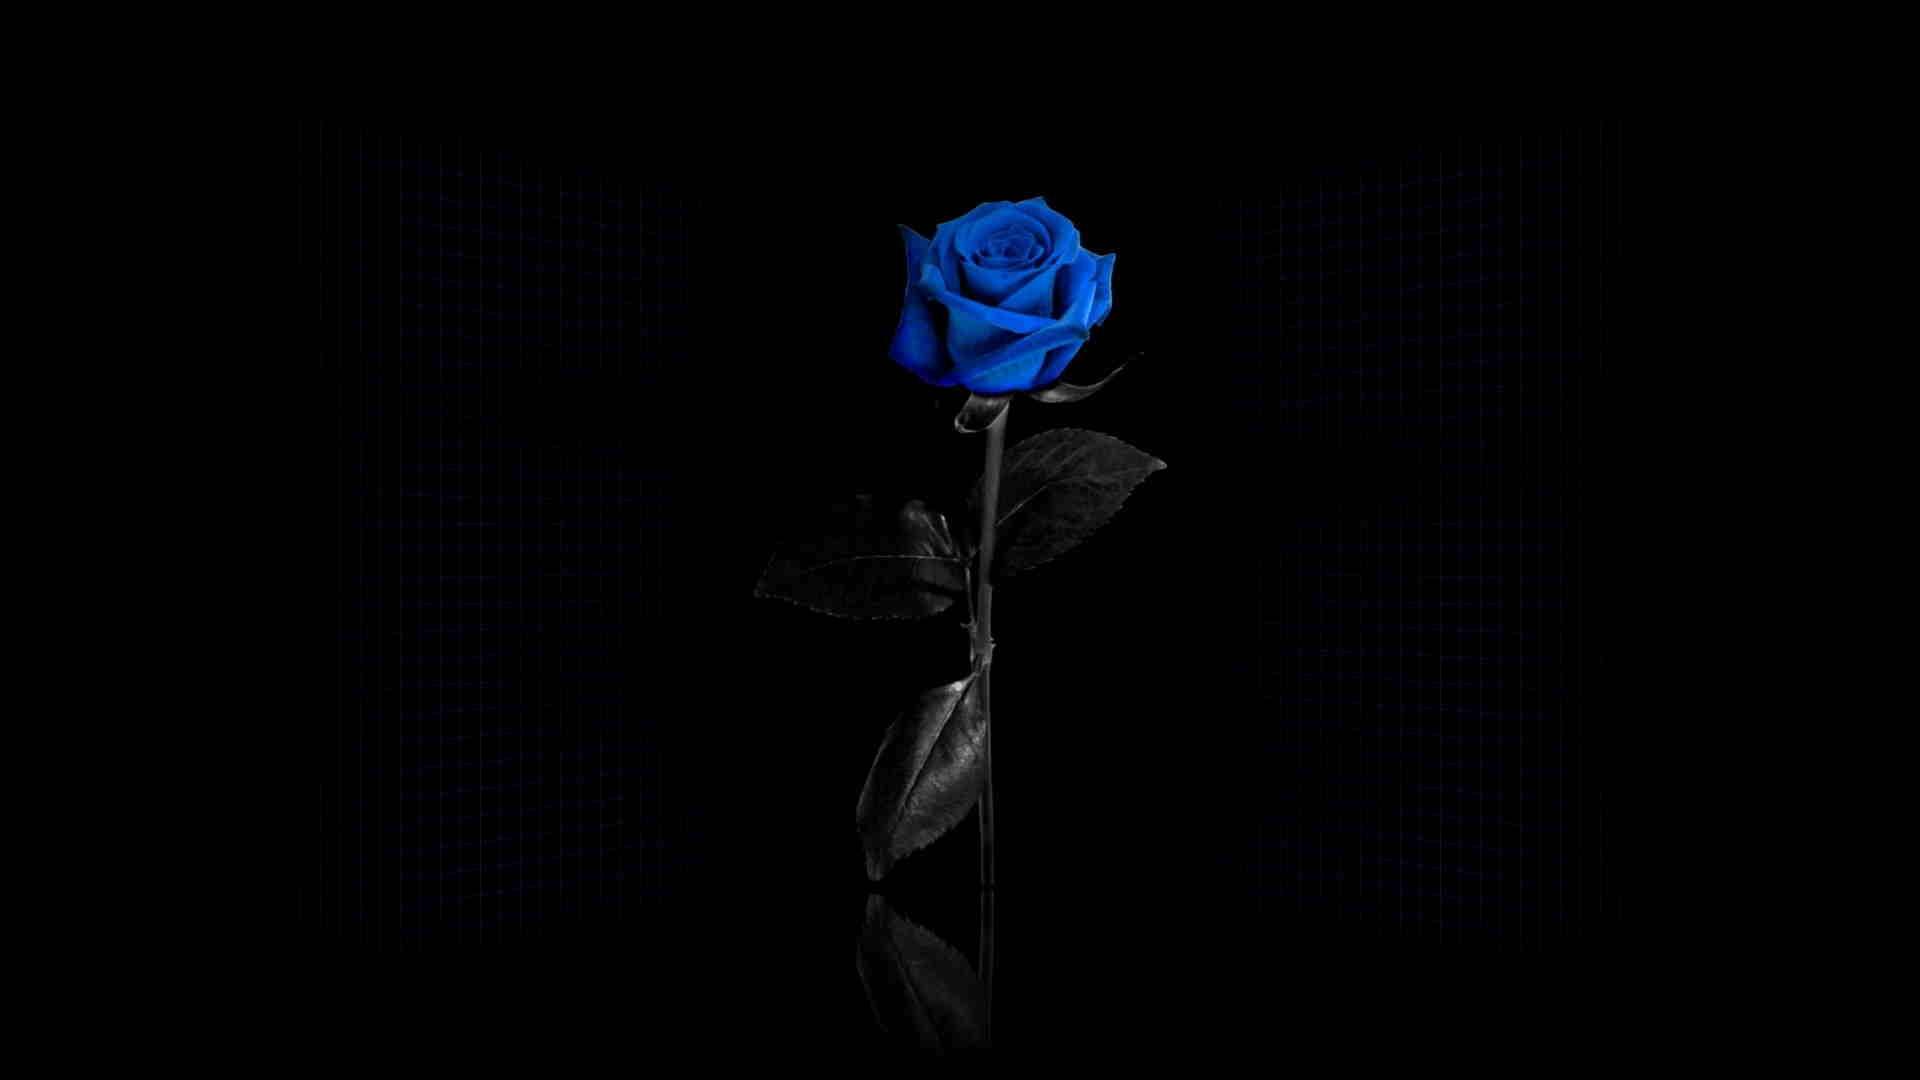 پروفایل گل آبی در محیط مشکی رنگ خاص